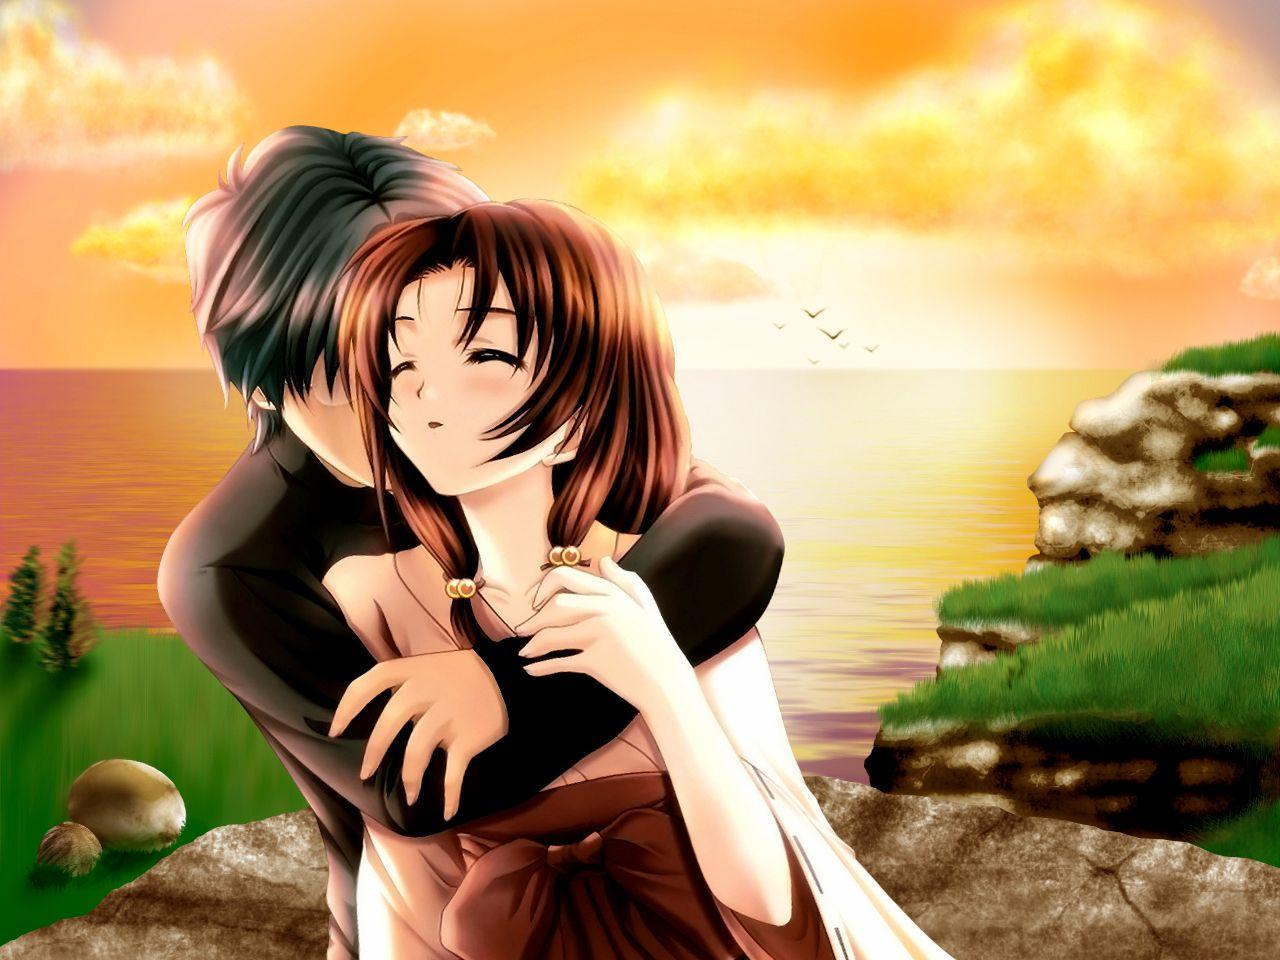 Anime Couple Love Romance Hd Wallpaper Anime Romantic Couples Cute Couple Wallpaper Love Couple Wallpaper Love Cartoon Couple